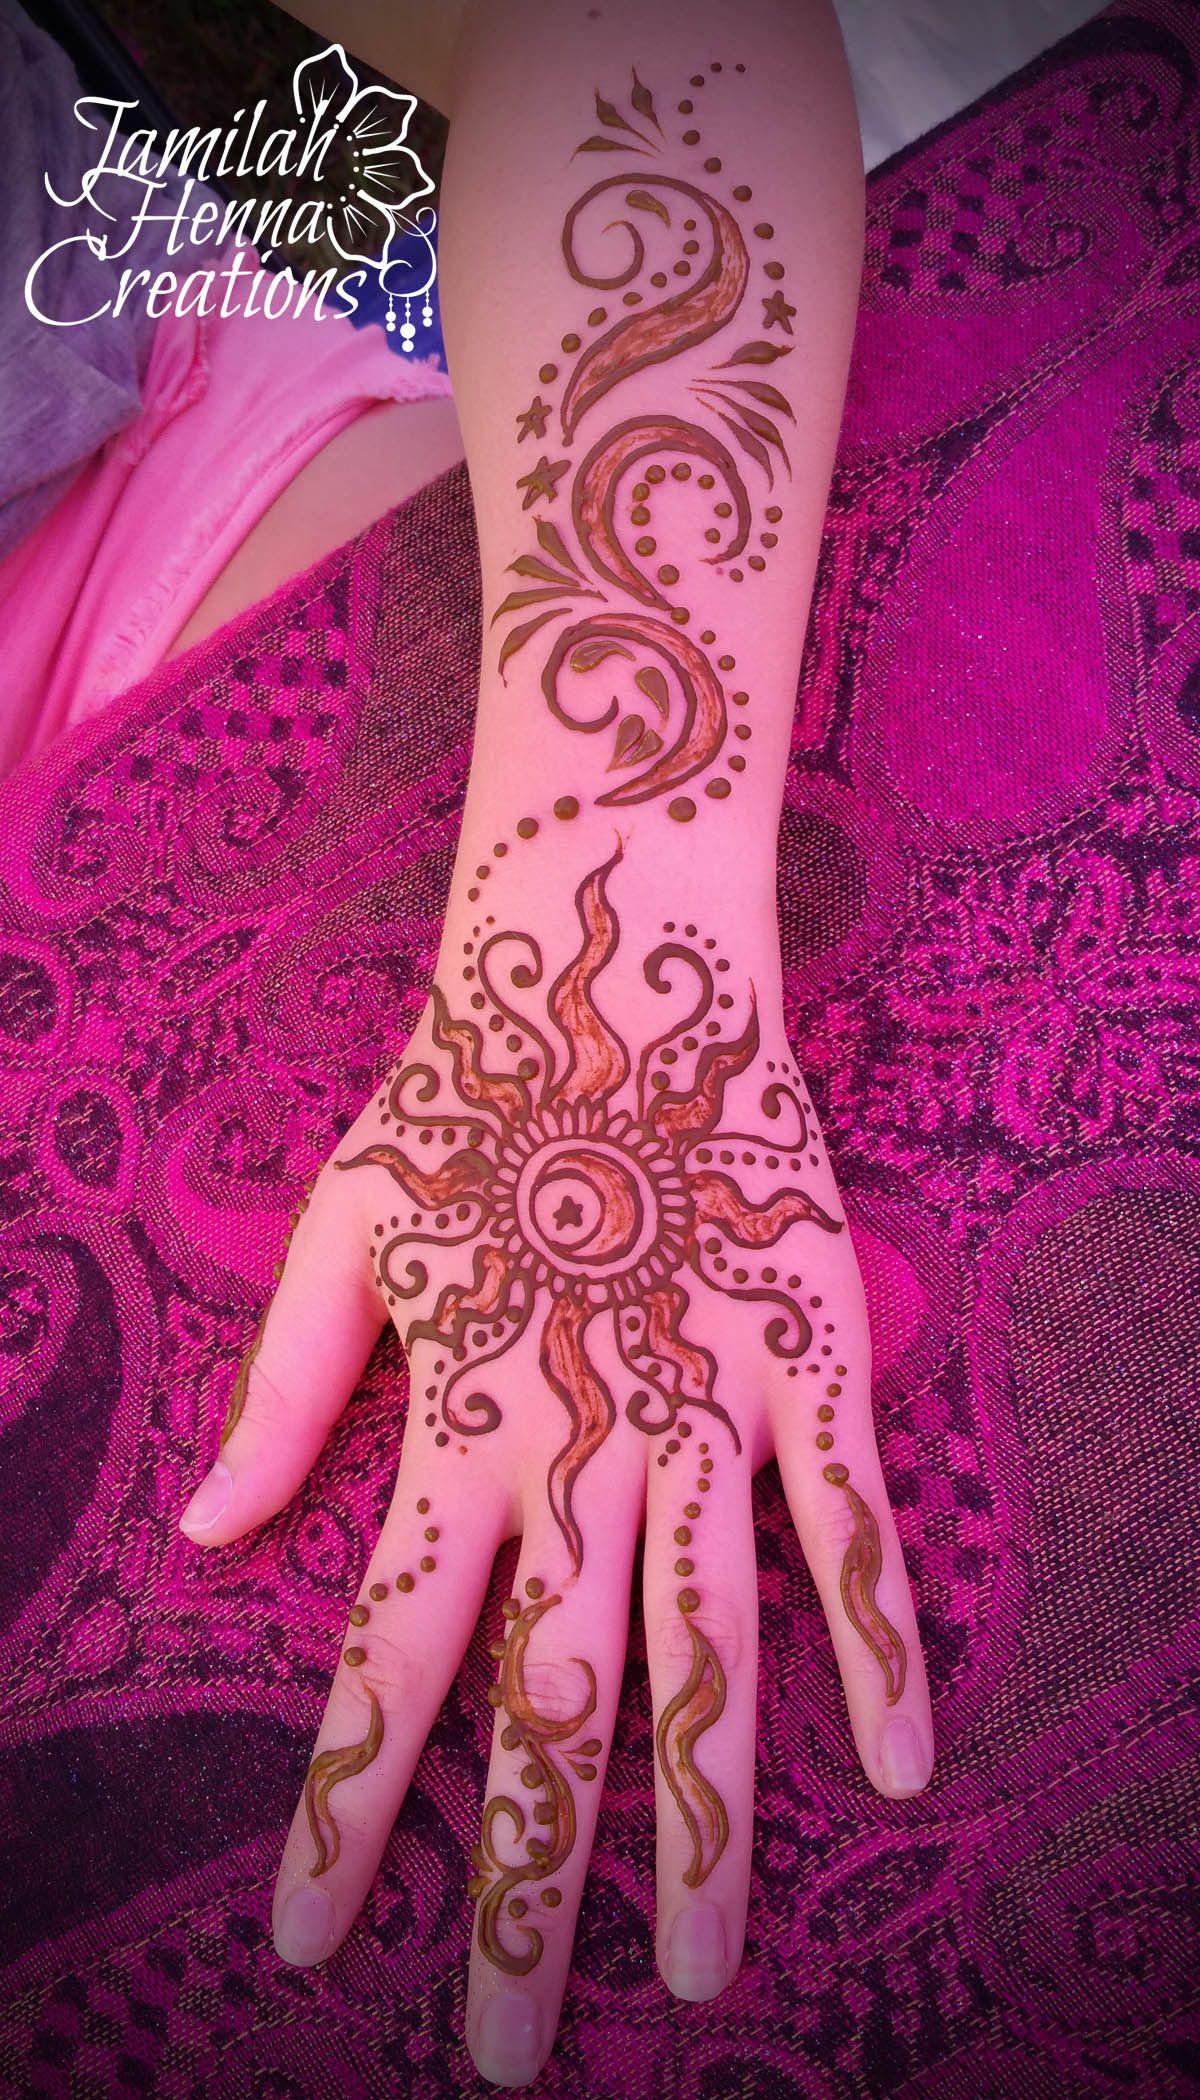 Sun Moon And Stars Henna Www Jamilahhennacreations Com Henna